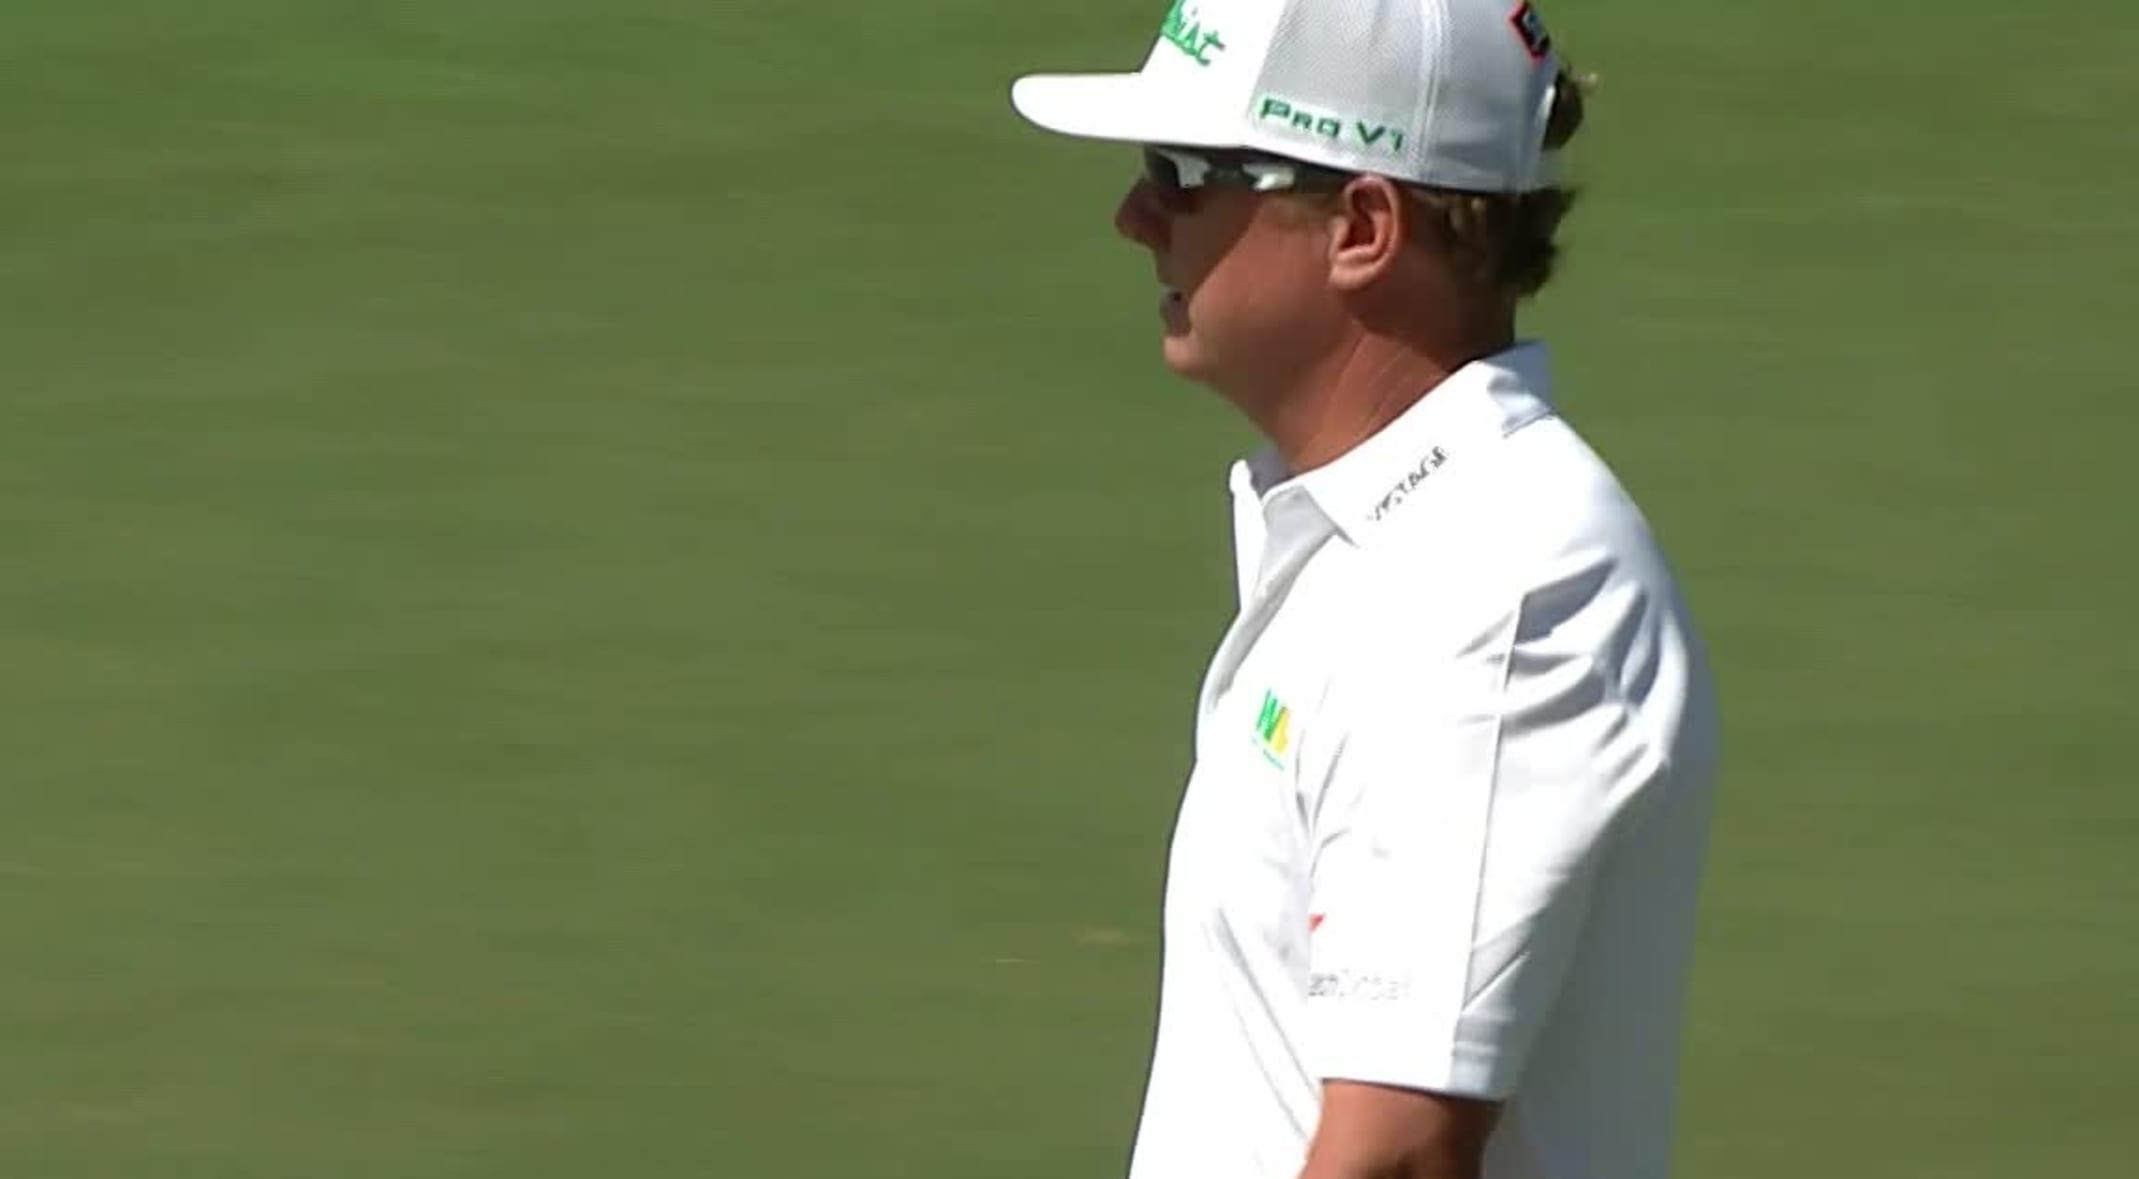 5efabc94b2705 Charley Hoffman Round 2 Recap at 2019 PLAYERS Championship - PGA Tour